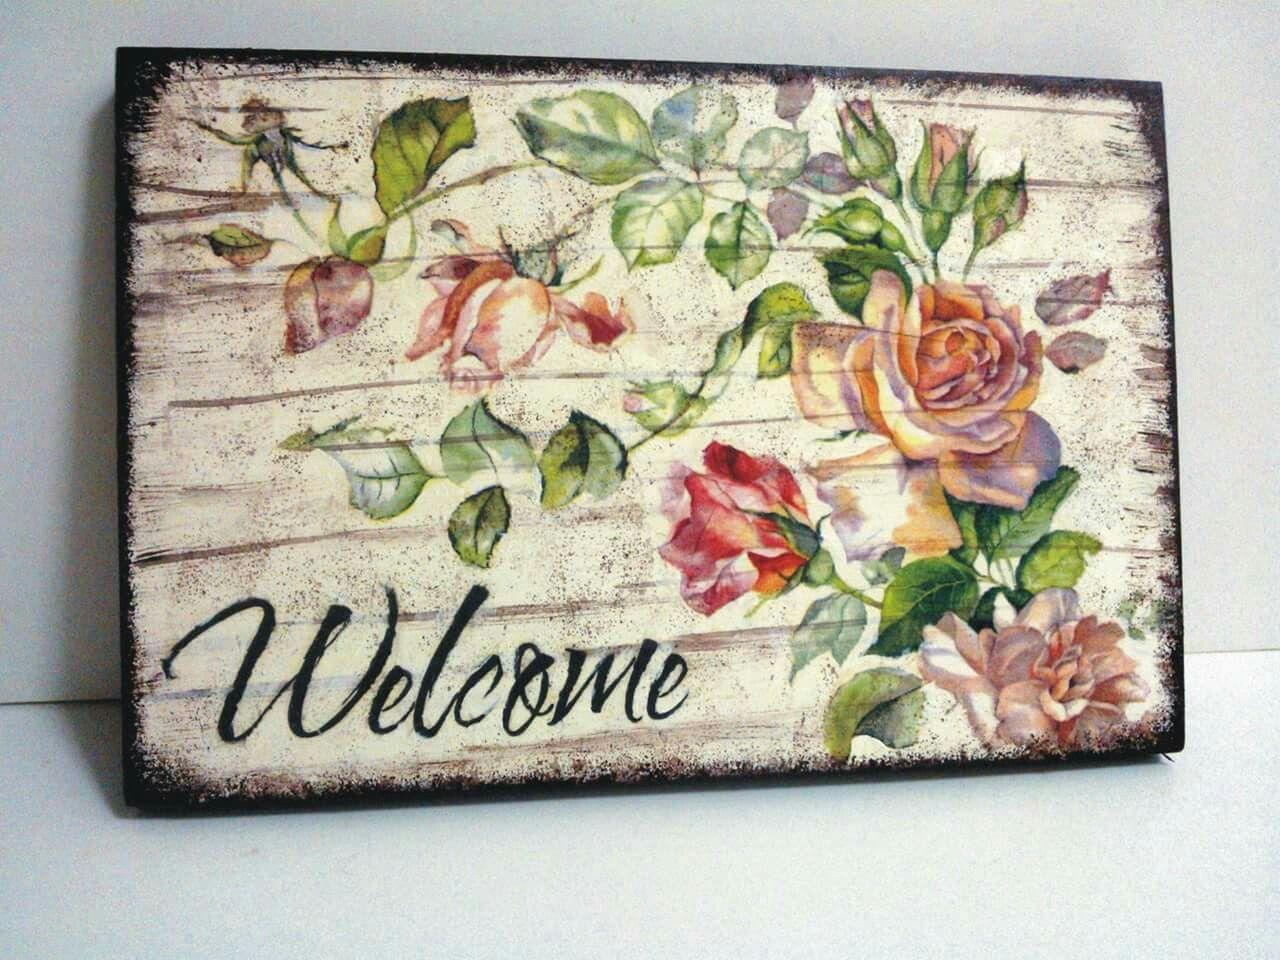 429f2da5f Decoupage On Canvas, Decoupage Wood, Decoupage Ideas, Diy Home Crafts,  Decor Crafts